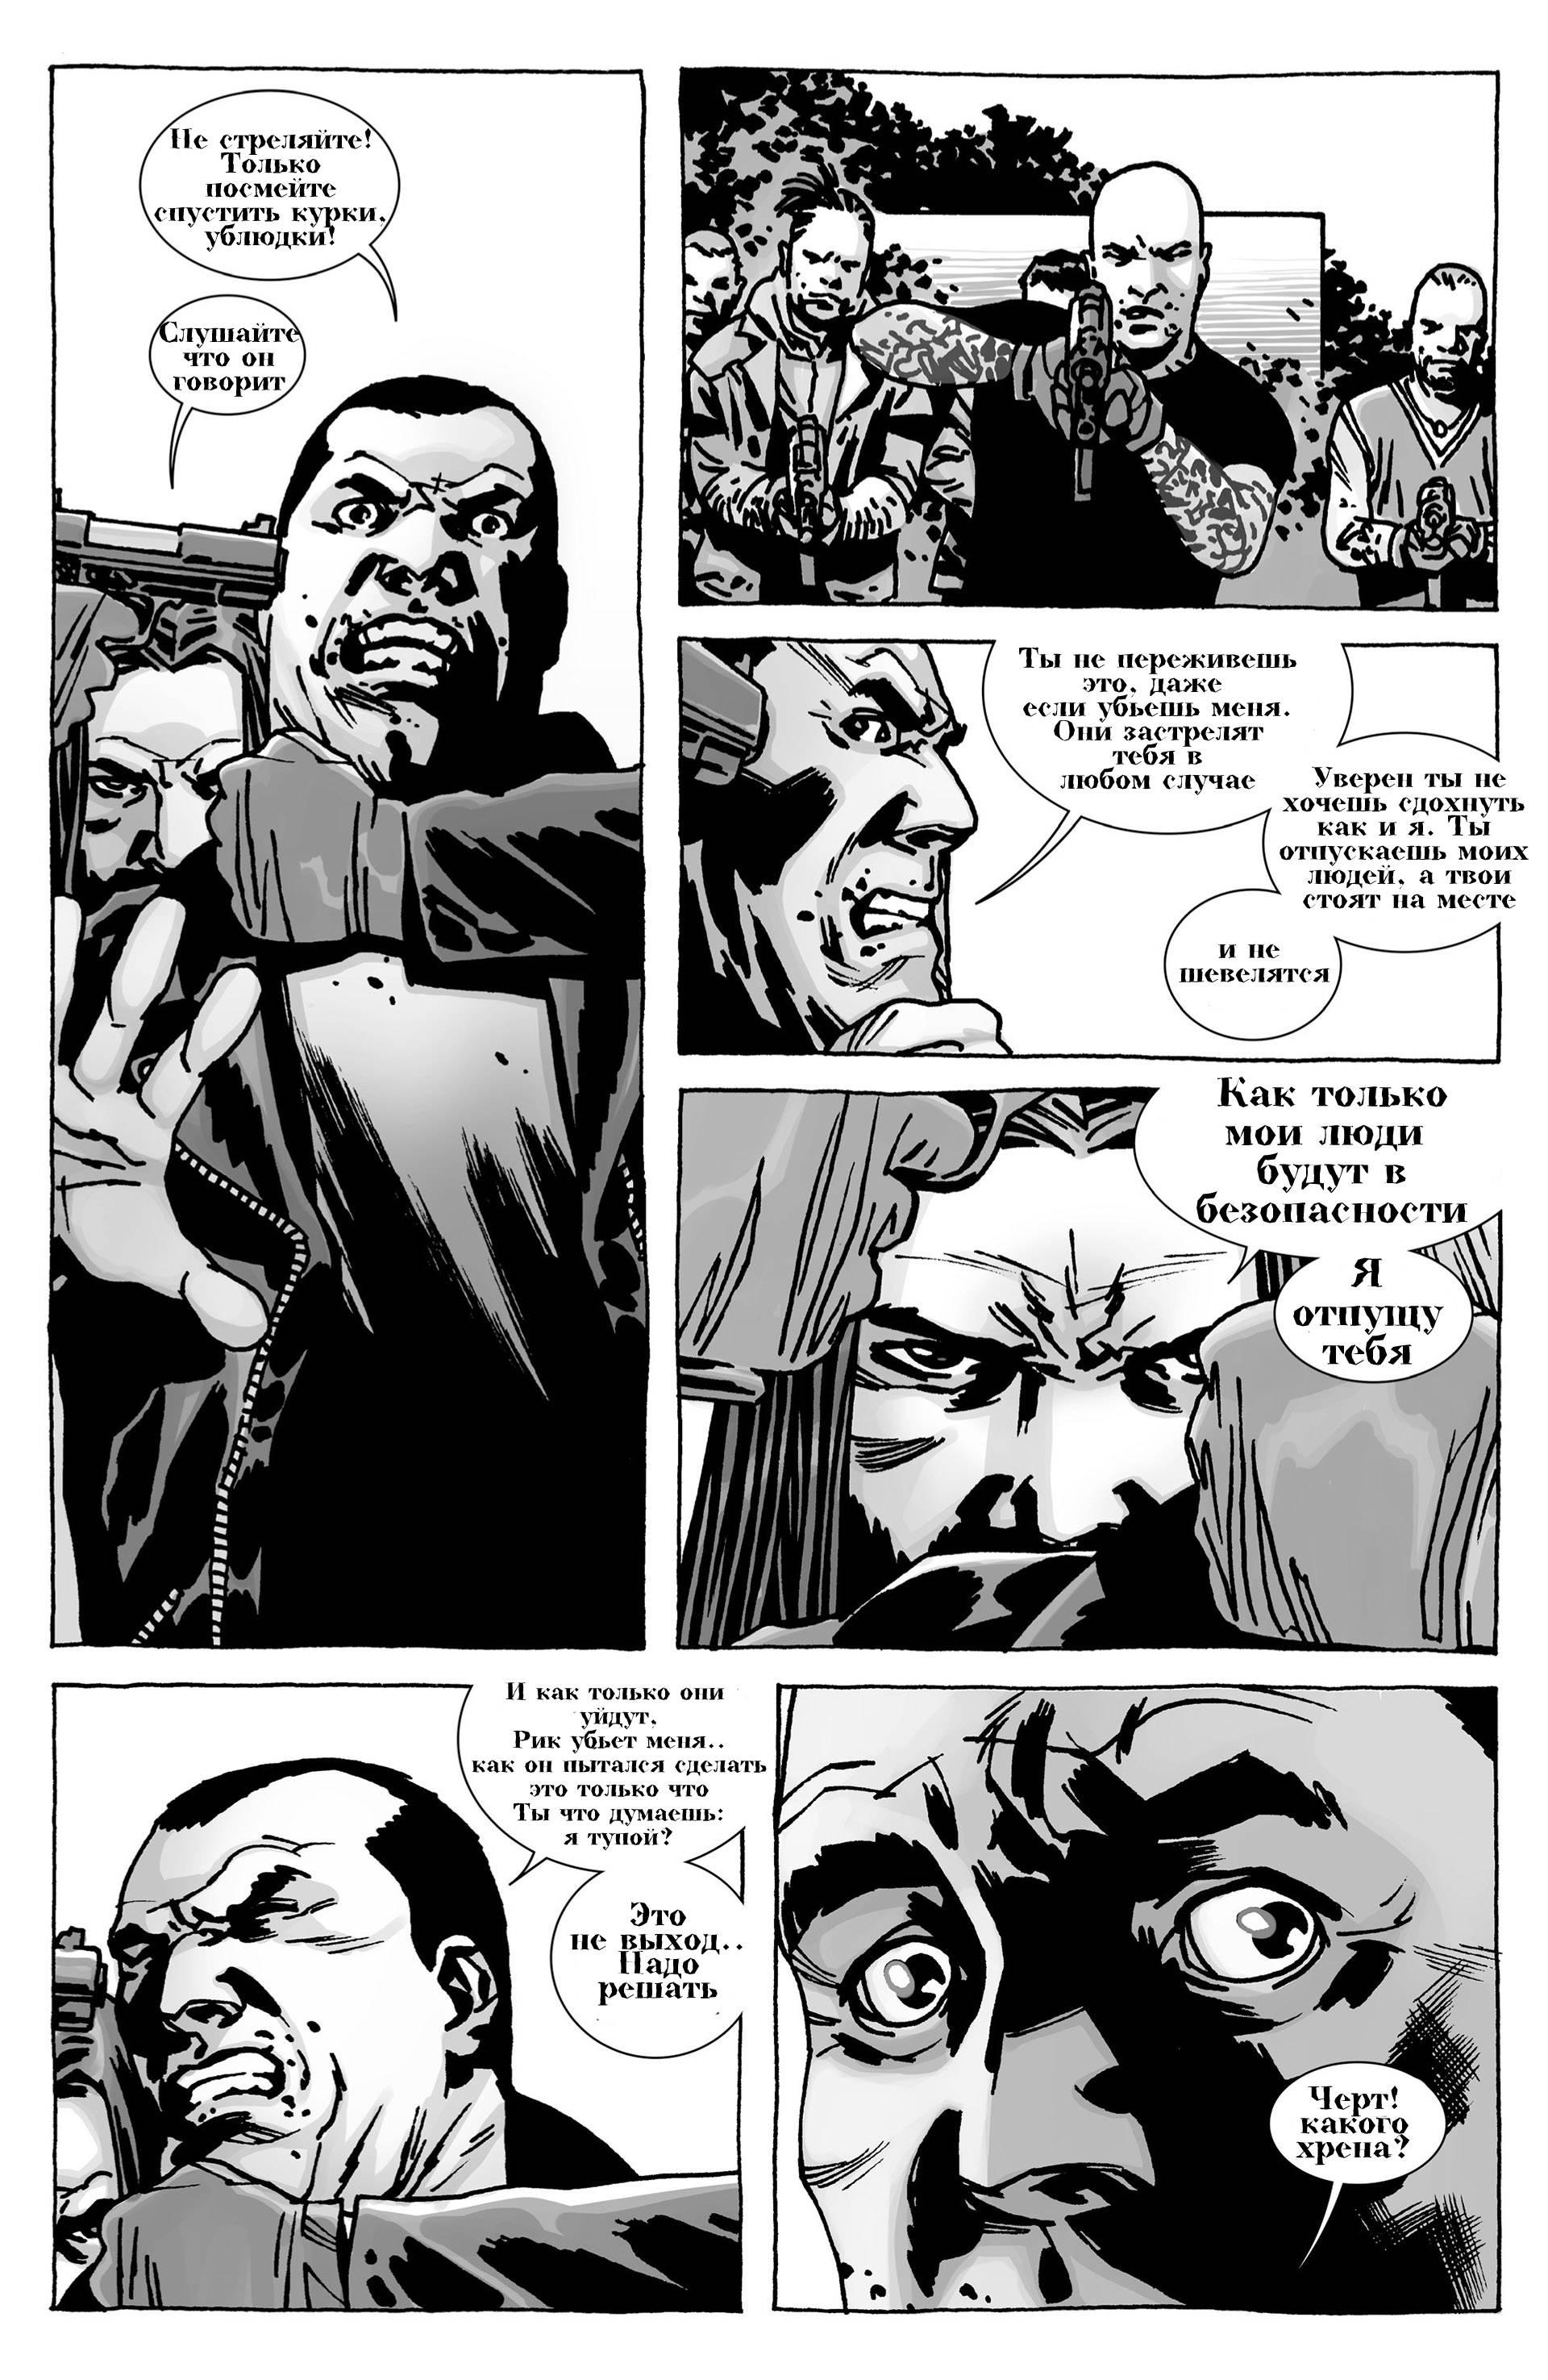 http://img1.unicomics.com/comics/the-walking-dead/the-walking-dead-114/08.jpg